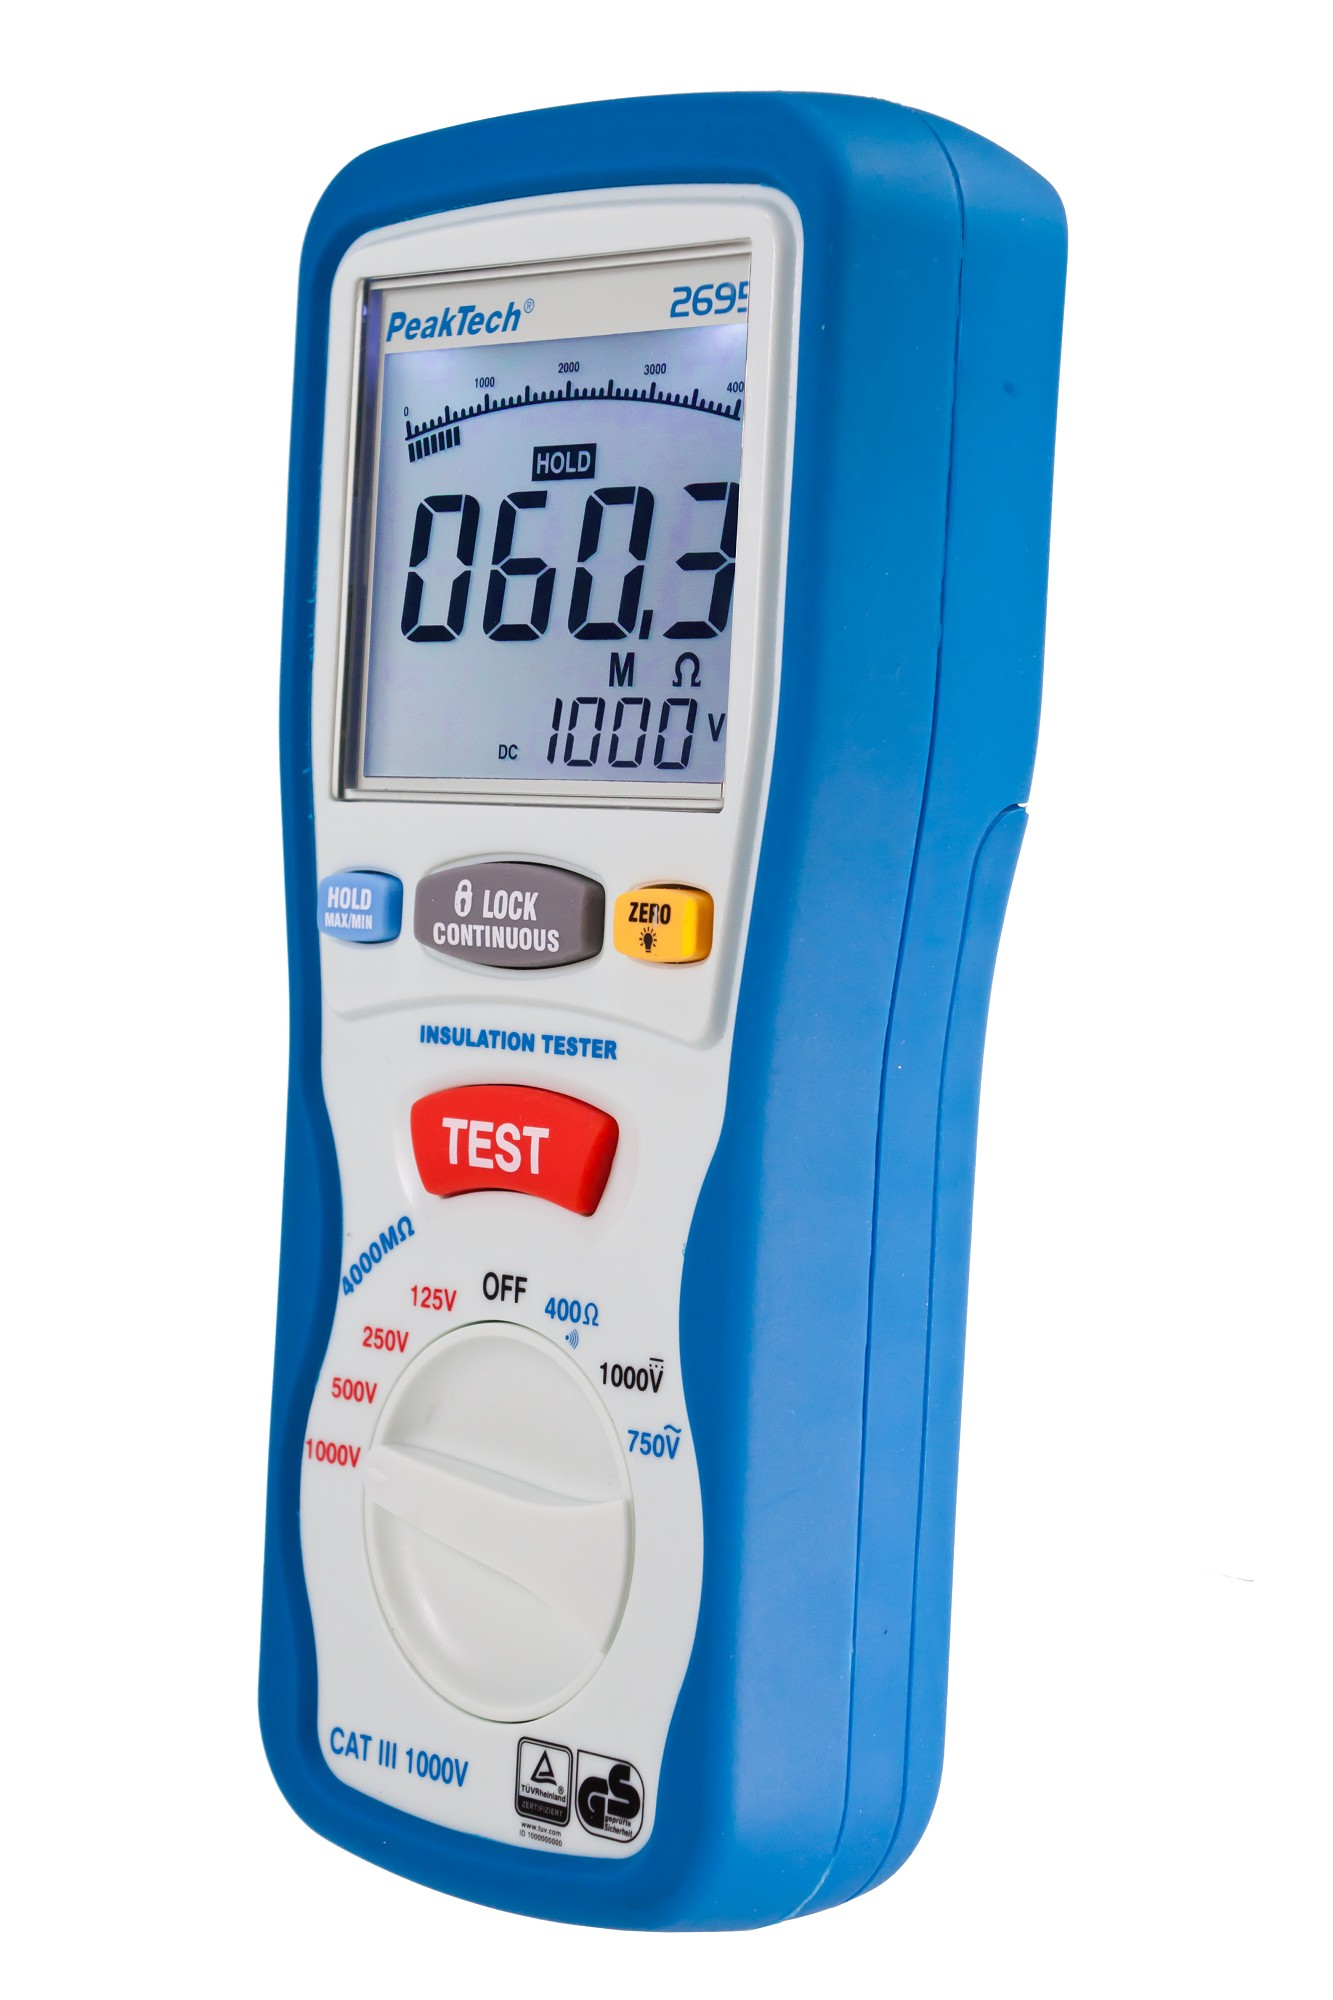 «PeakTech® P 2695» Insulation tester 125/250/500/1000 V /4000 MΩ